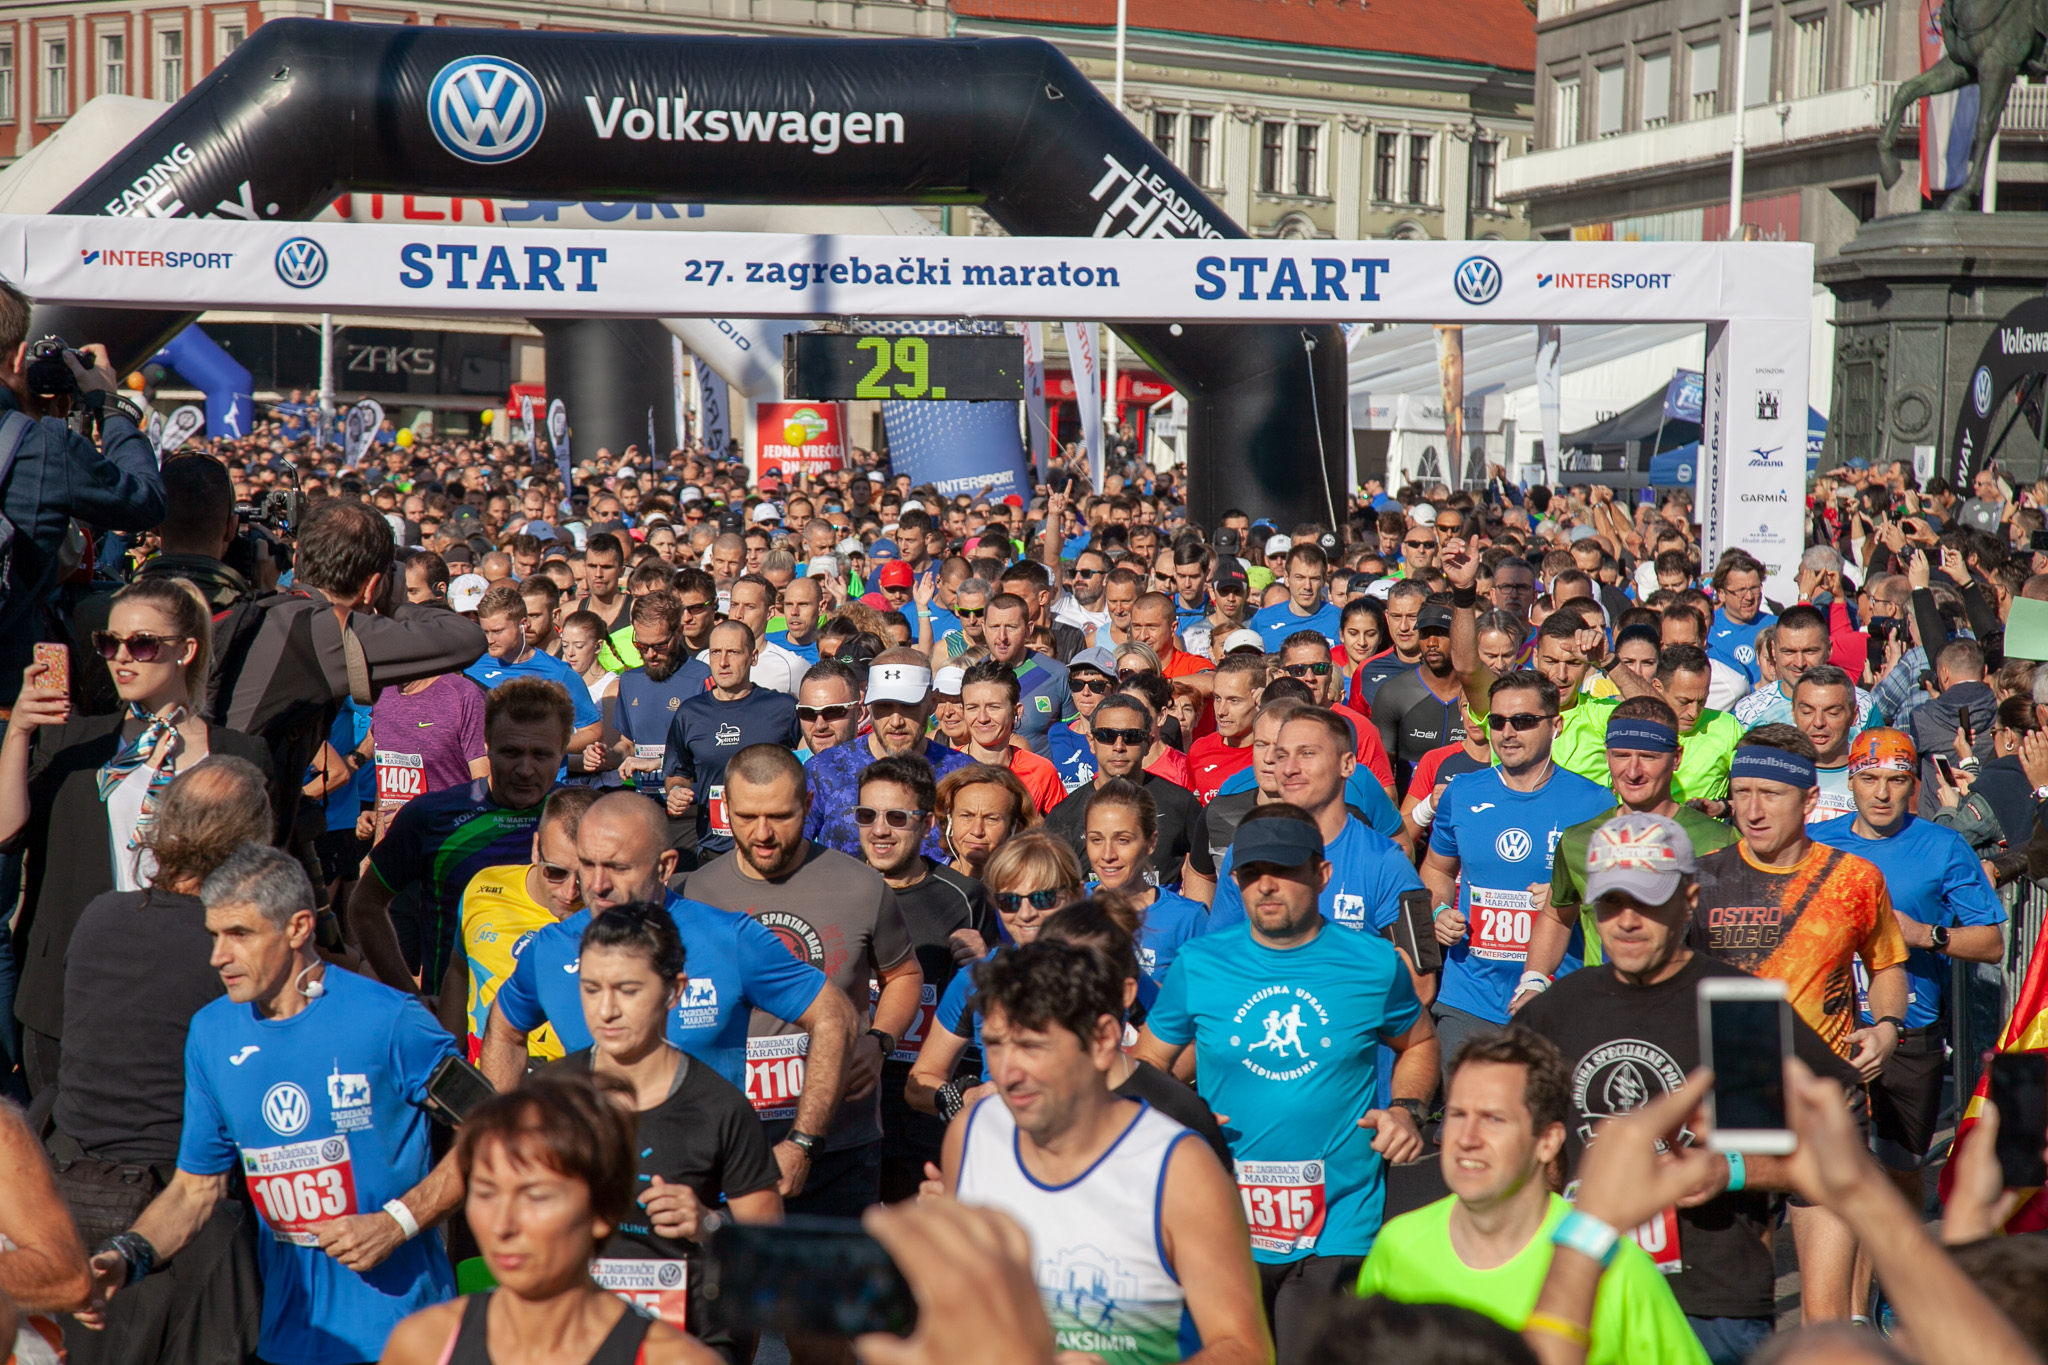 28 Po Redu Priprema Se Najbolji Zagrebacki Maraton Ikad Moje